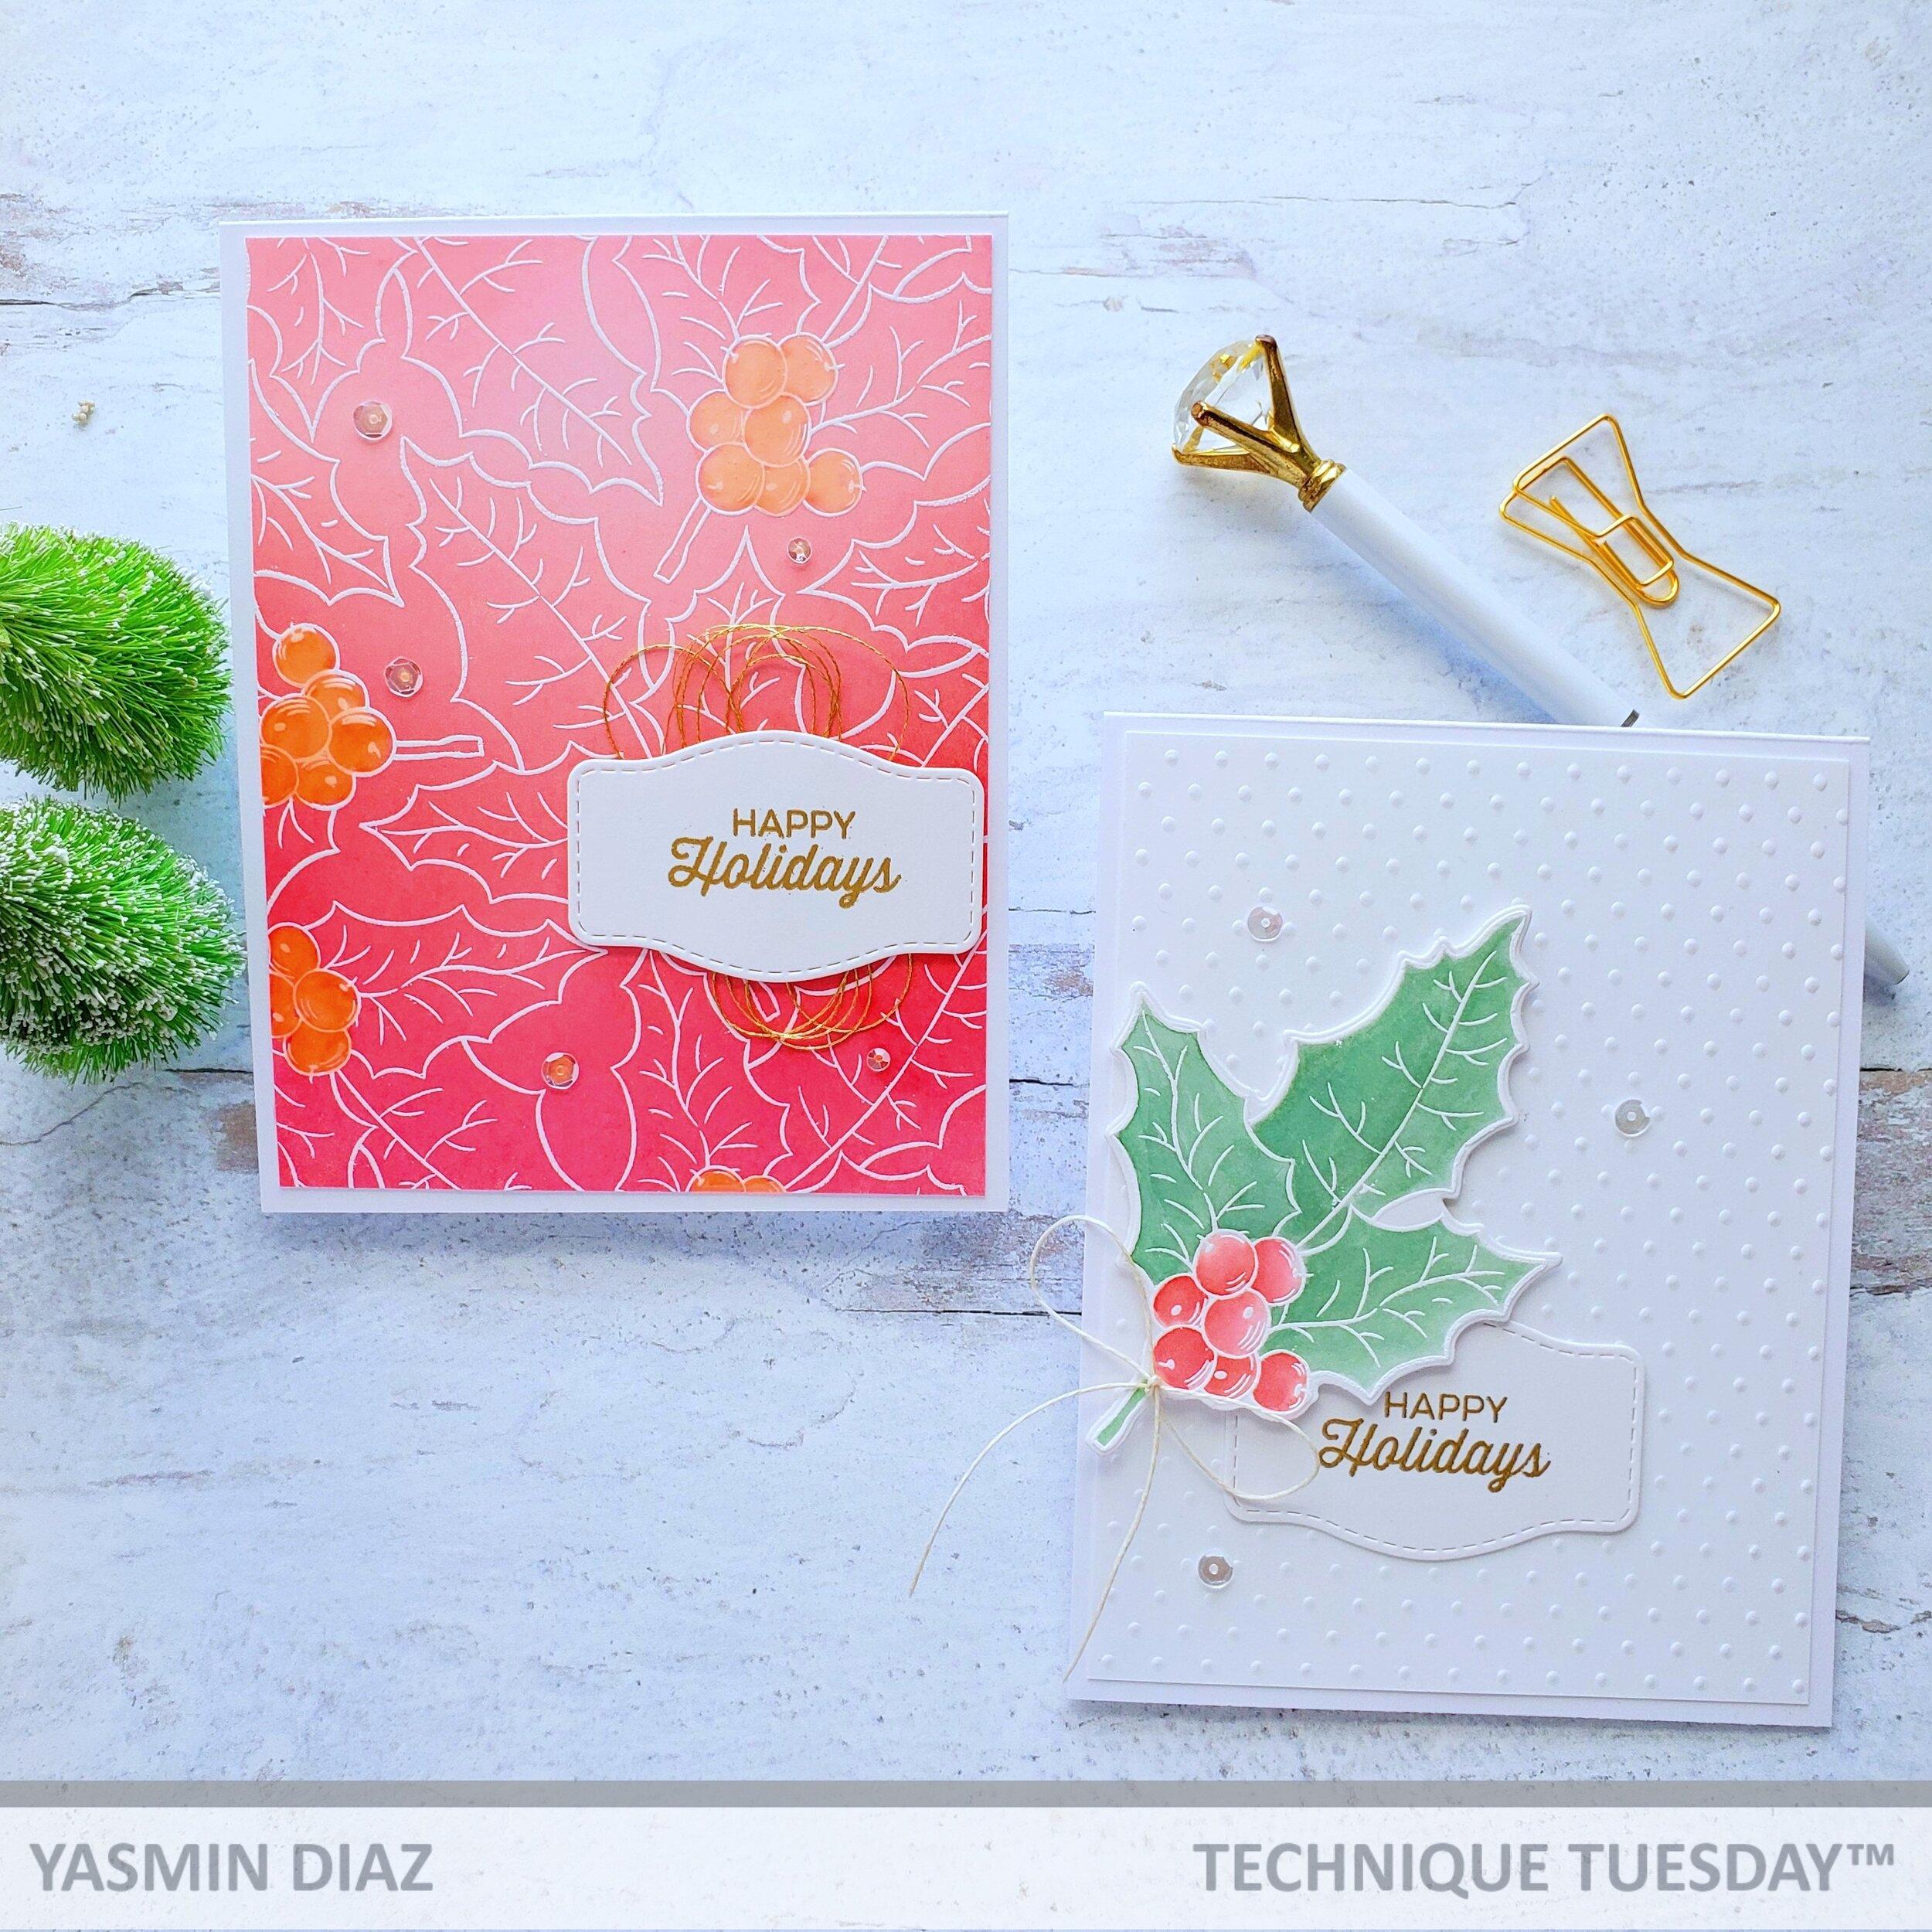 October-Yasmin-Diaz-Holly-Stamp-Cards-1.jpg